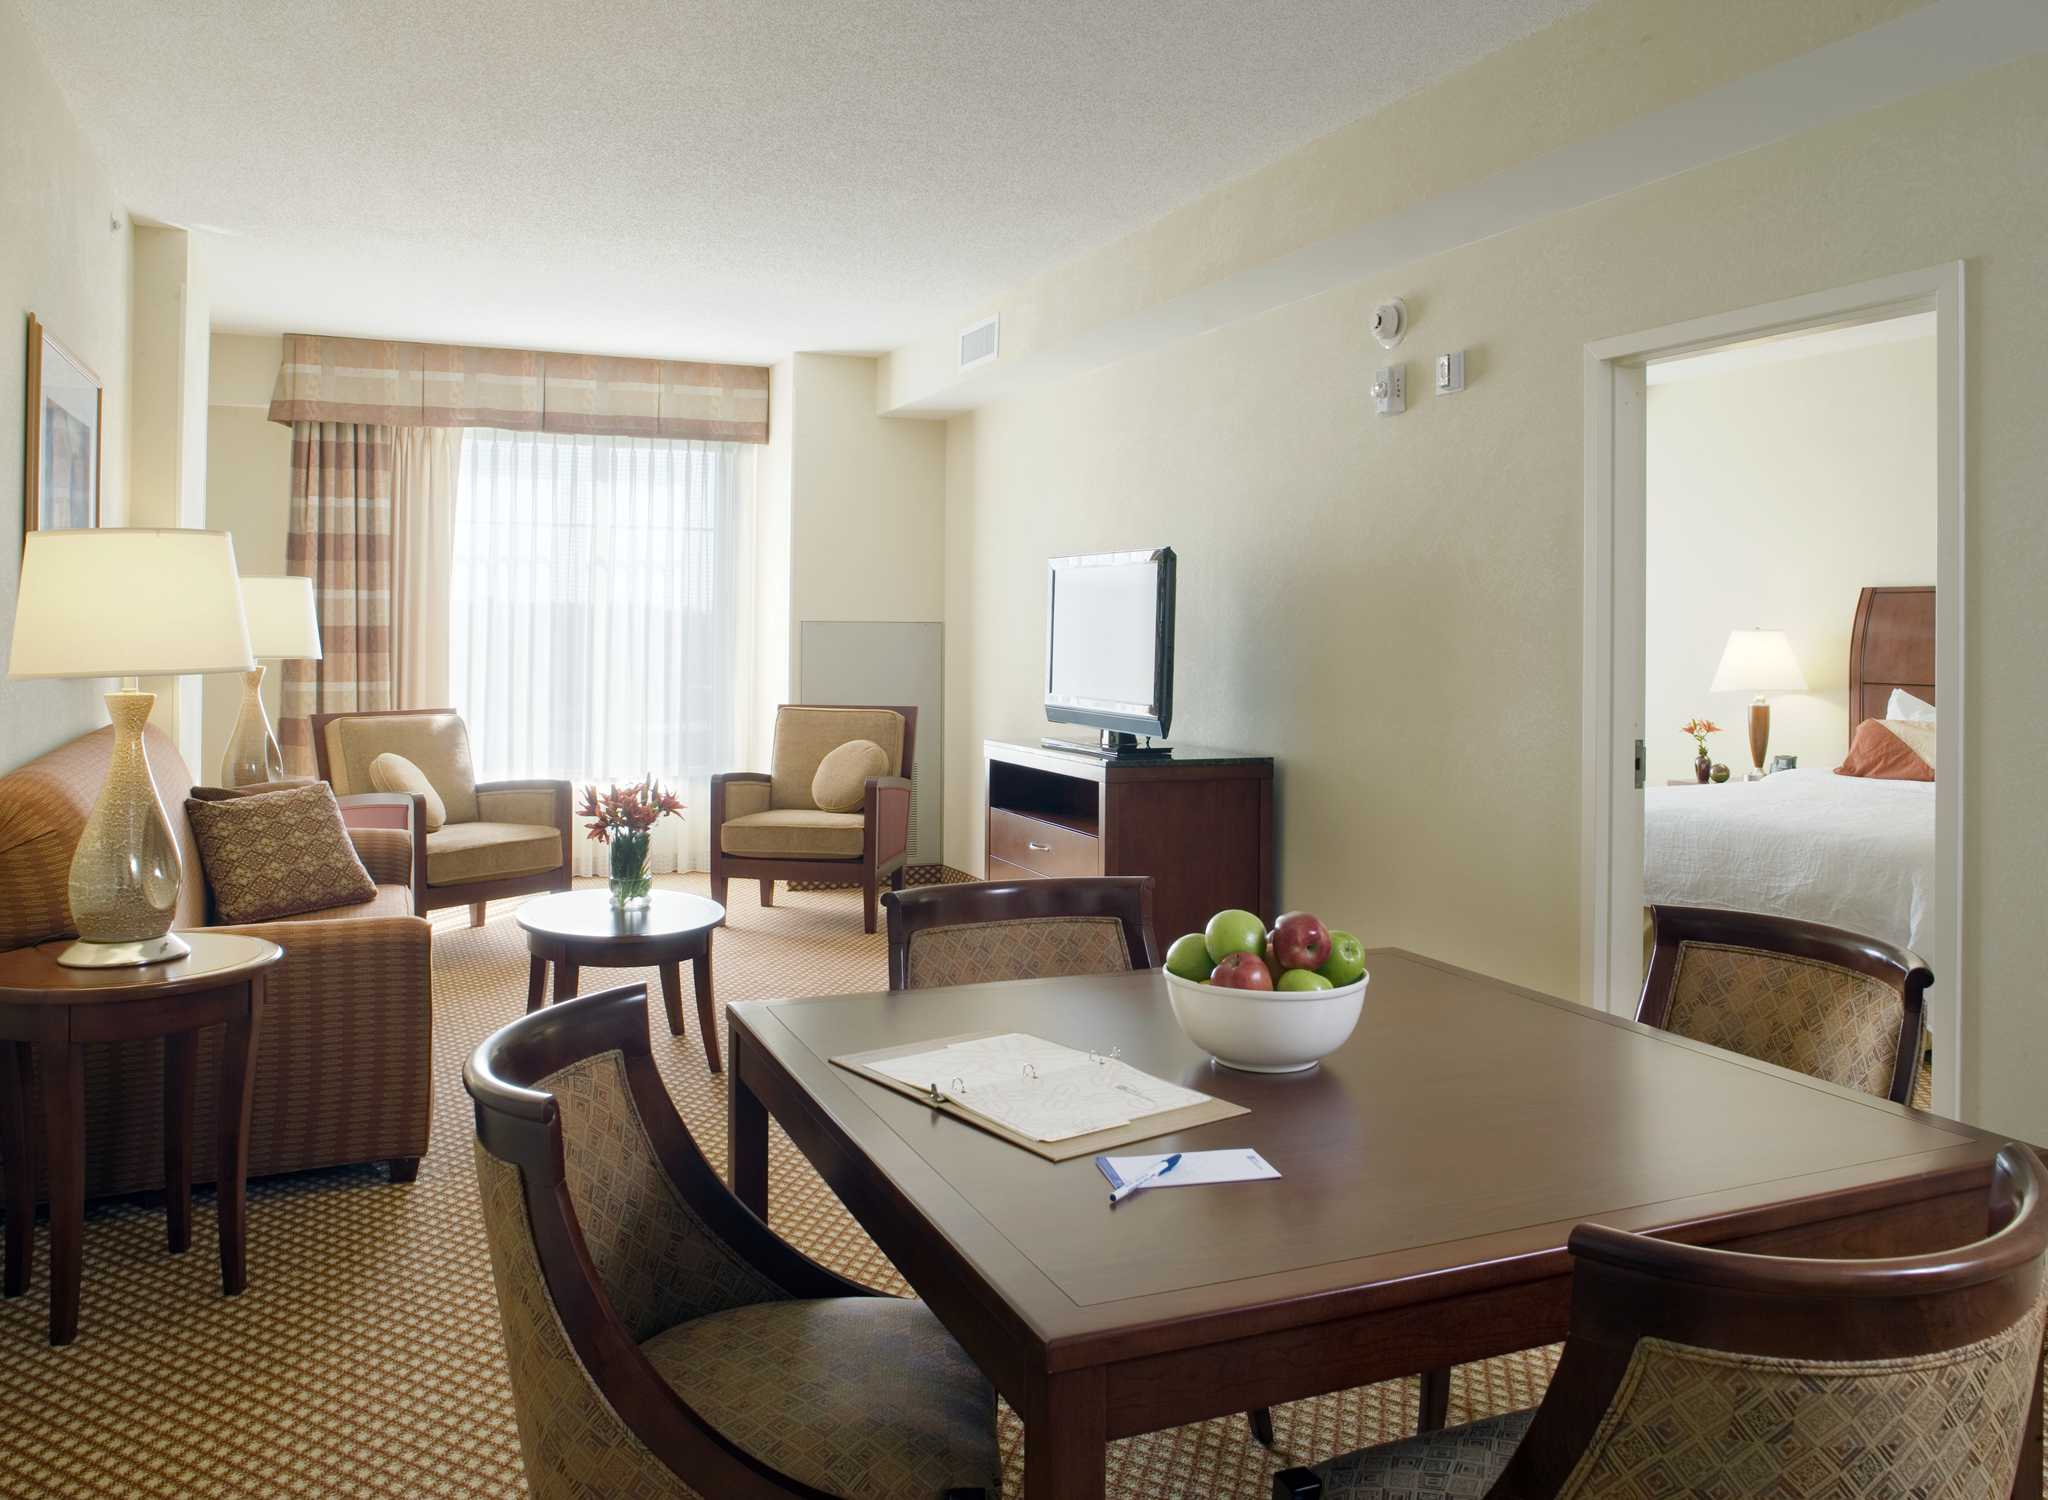 hotell hilton garden inn nashville vanderbilt tn musica suite - Hilton Garden Inn Vanderbilt